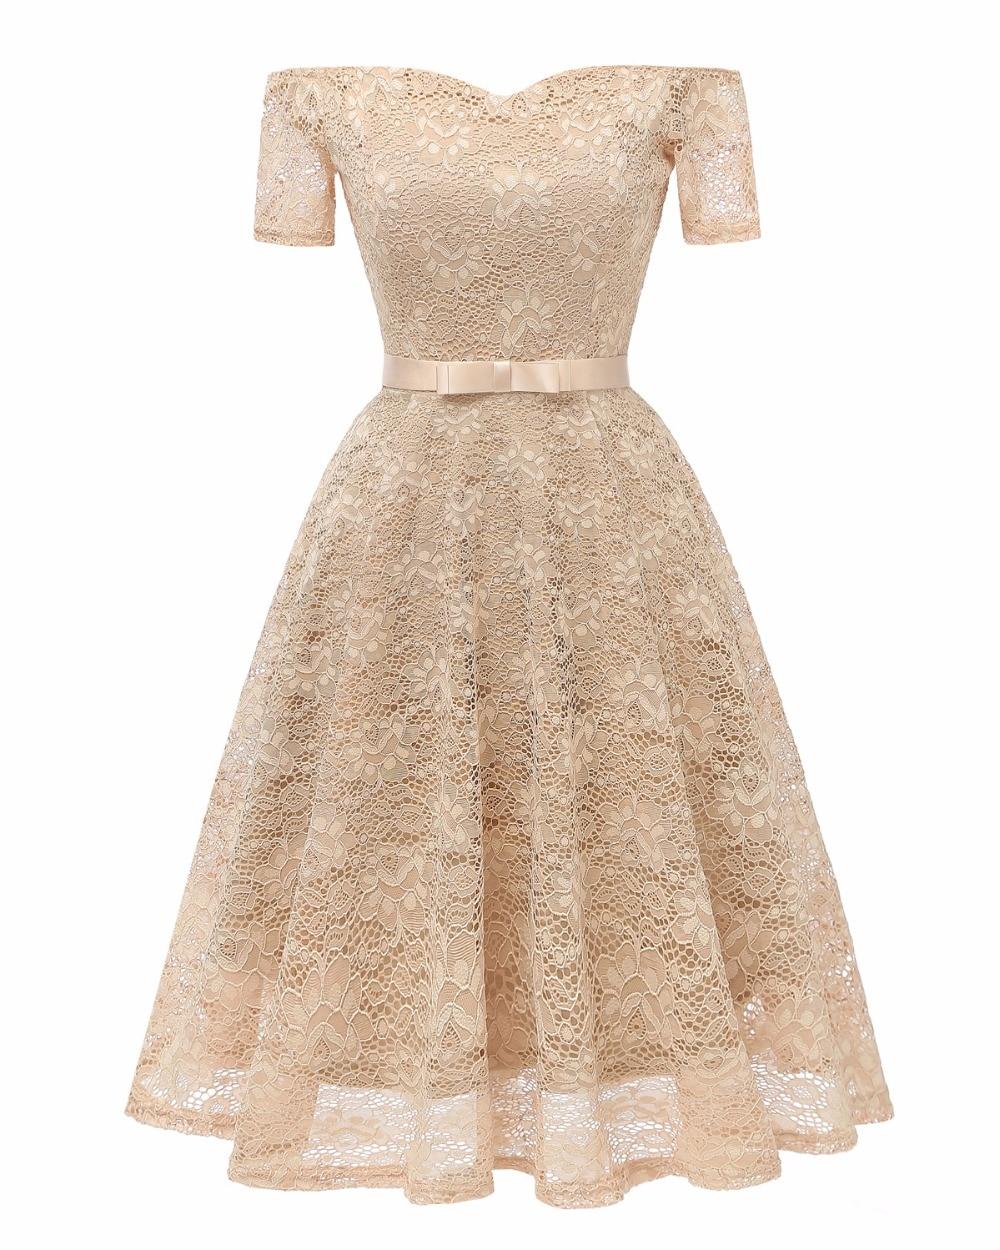 Female summer dress 2018 Off the Shoulder sweetheart Neck Retro Vintage 50s 60s Elegant Dress Lace Sexy vestidos de fiesta